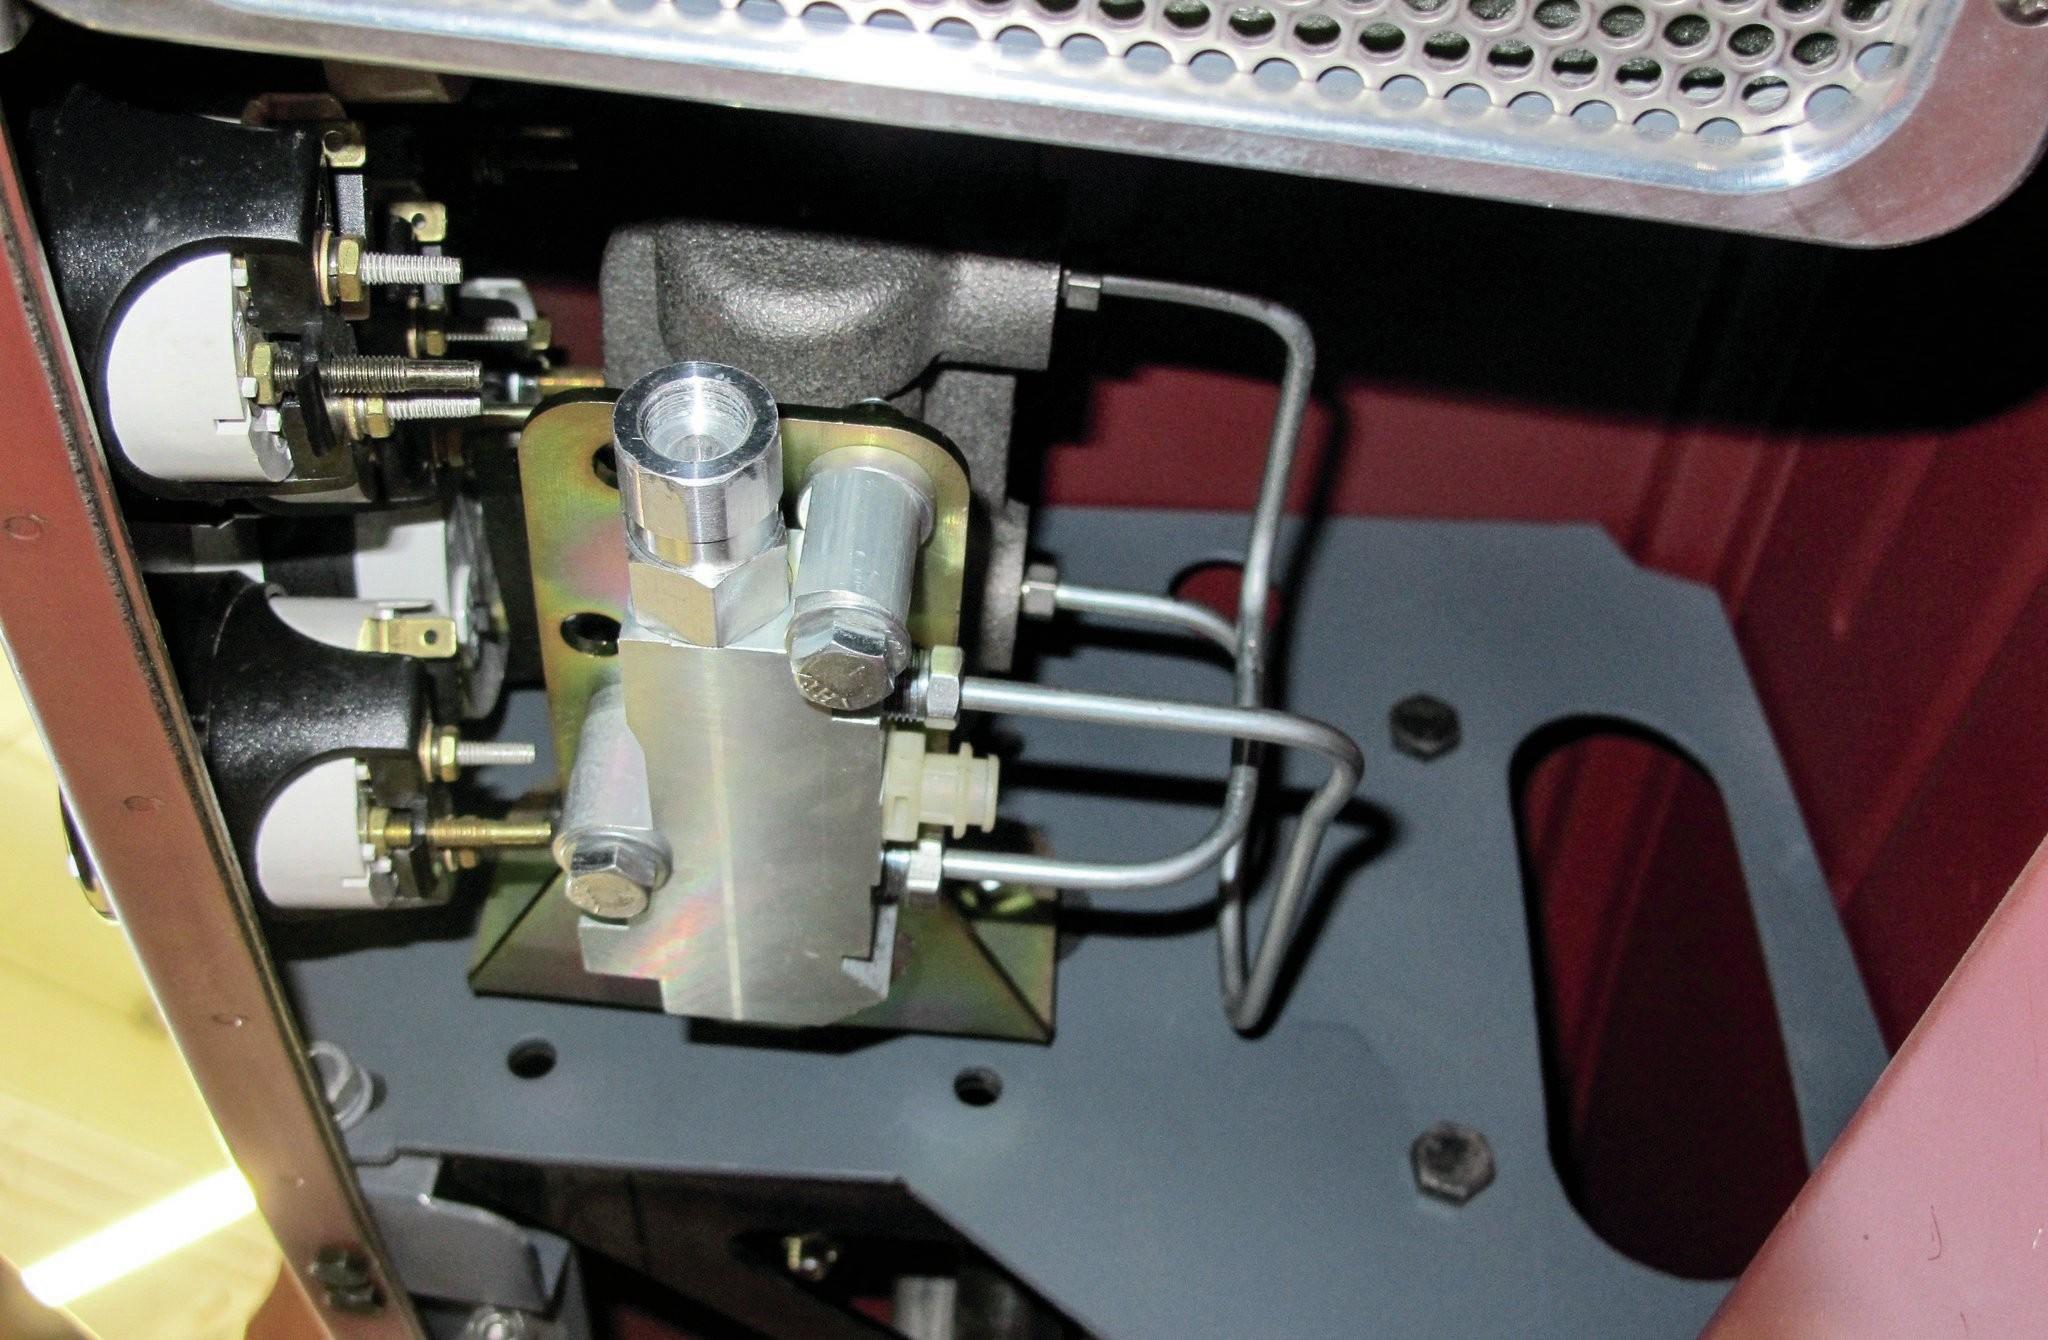 Gm Proportioning Valve Diagram Brake System Fabrication Hot Rod Brake Basics Hot Rod Network Of Gm Proportioning Valve Diagram